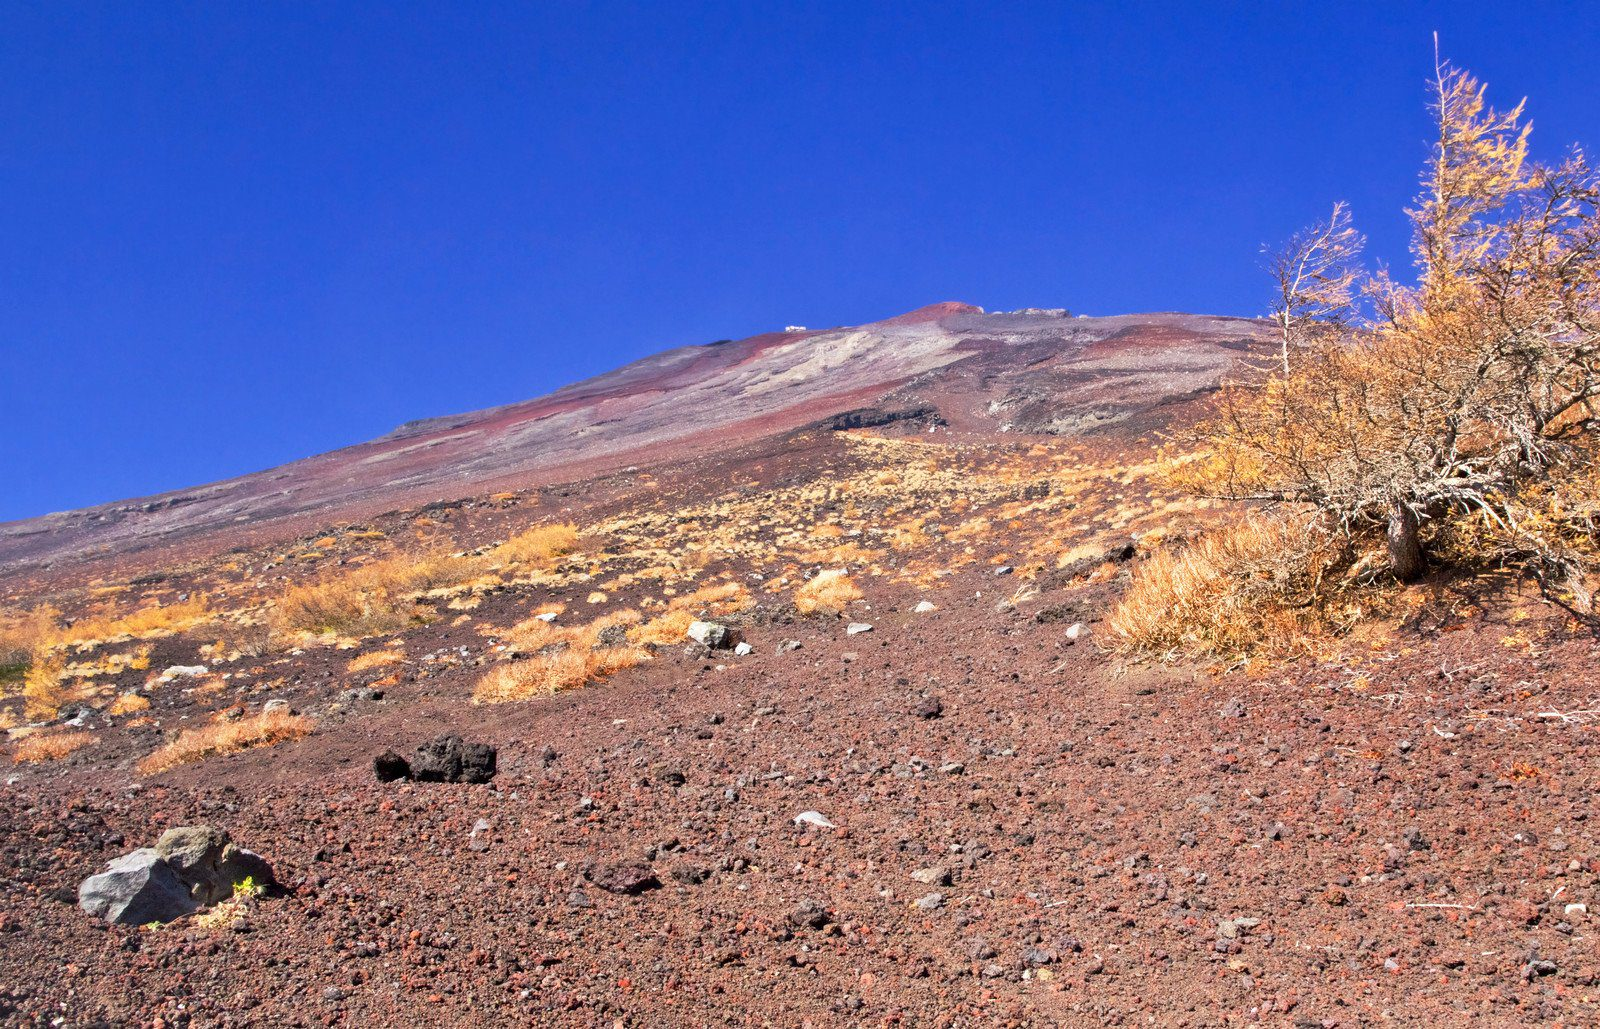 Looking up while climbing Mt Fuji